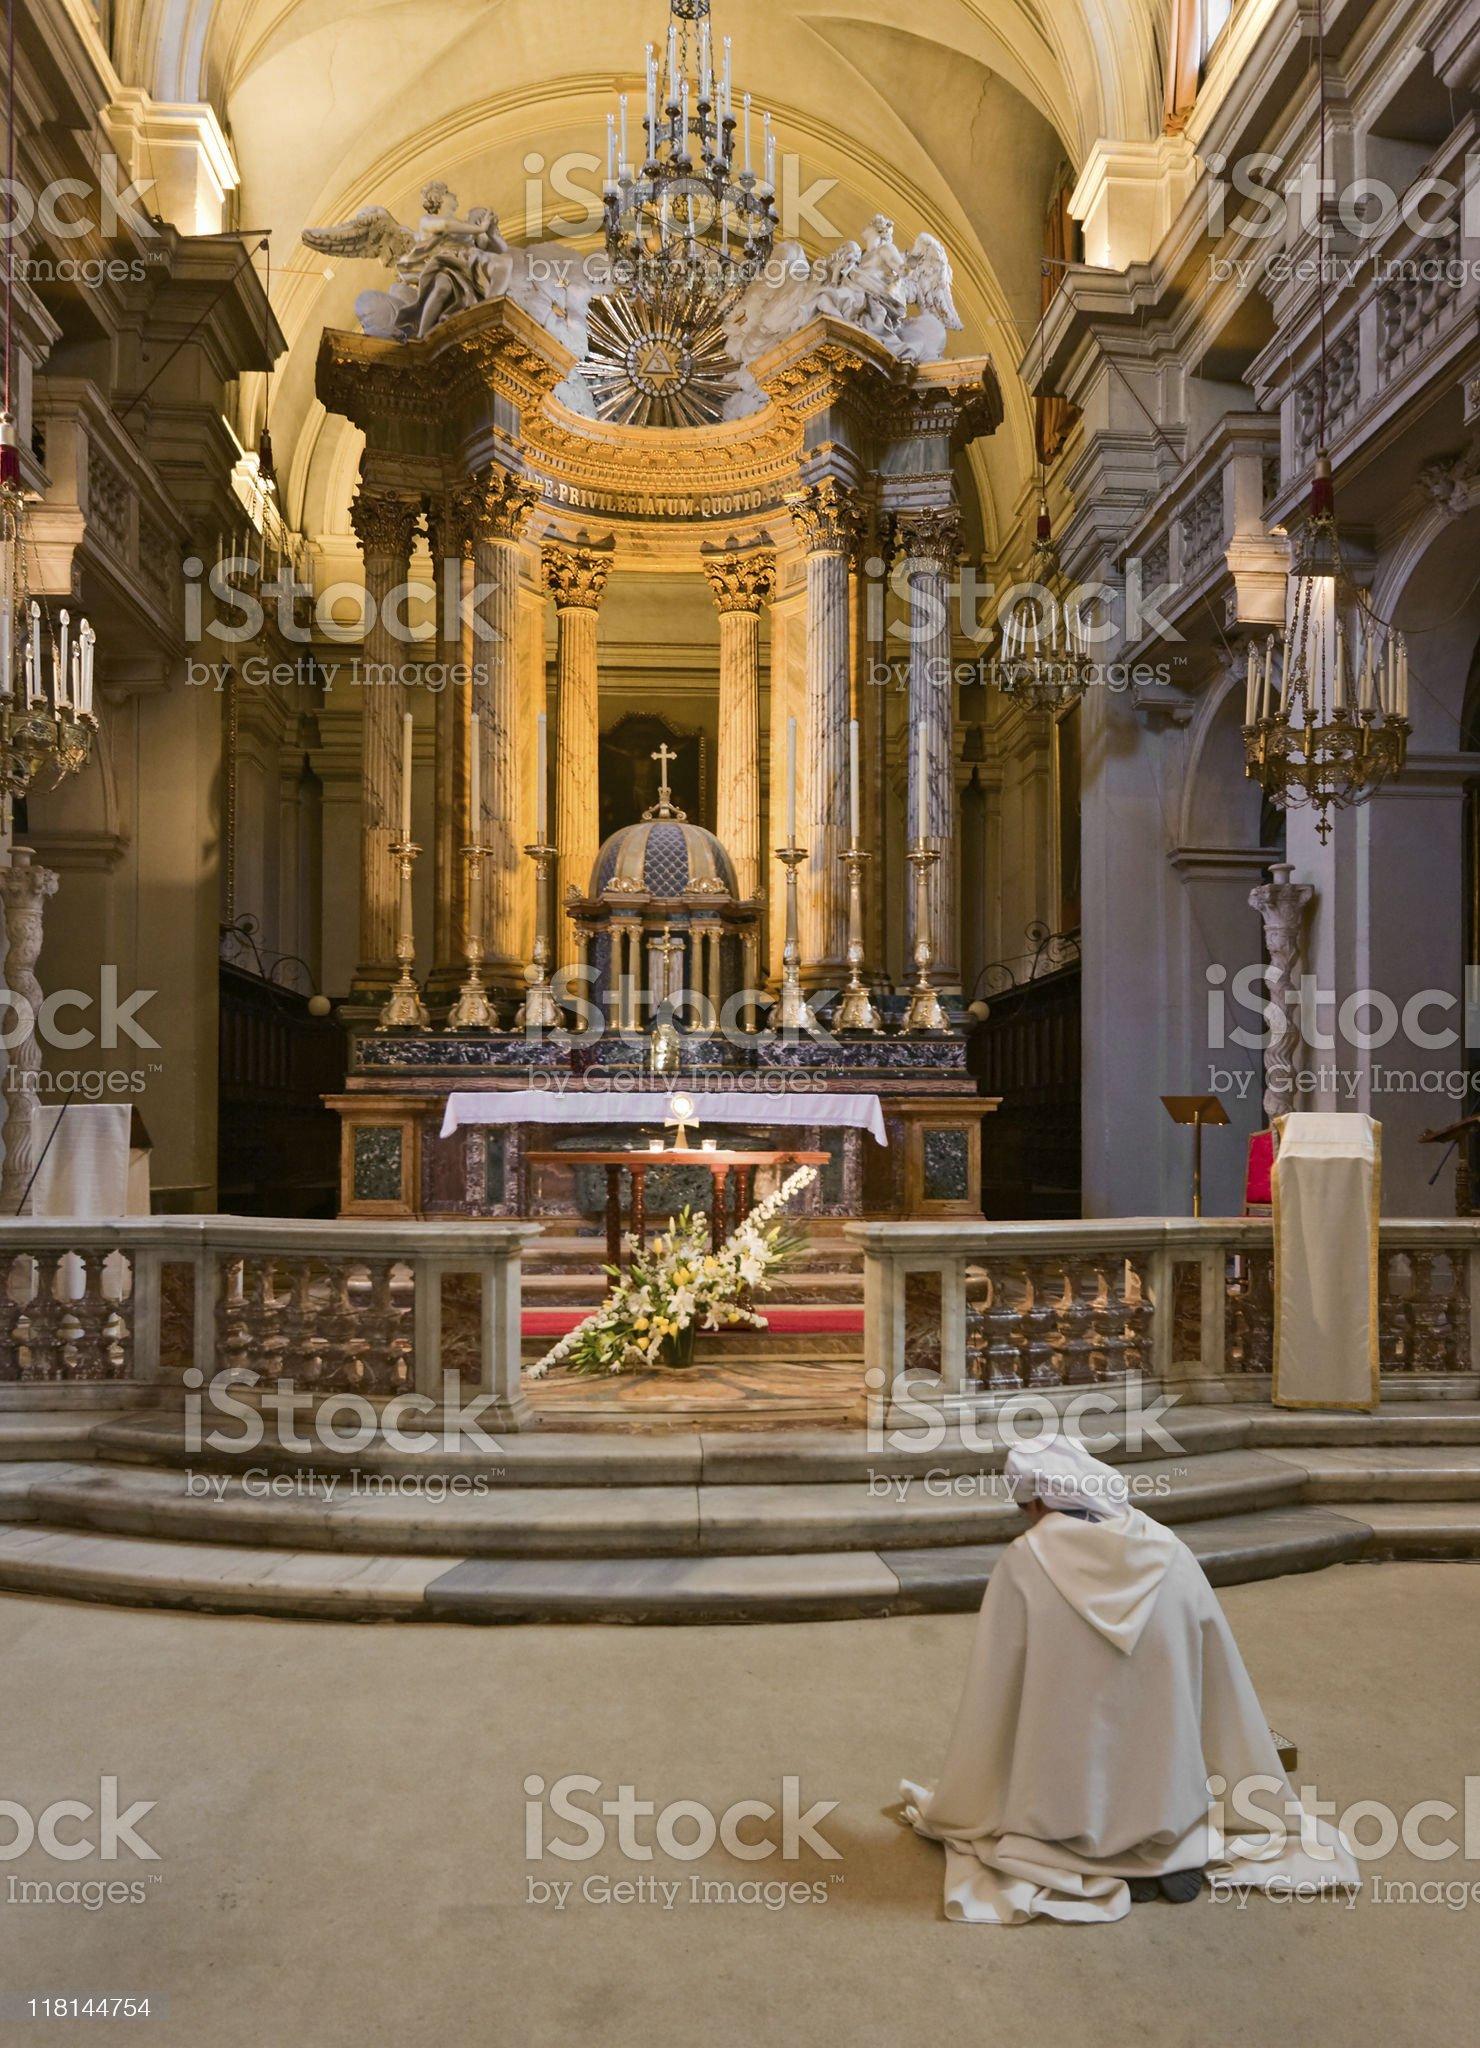 Praying alone royalty-free stock photo